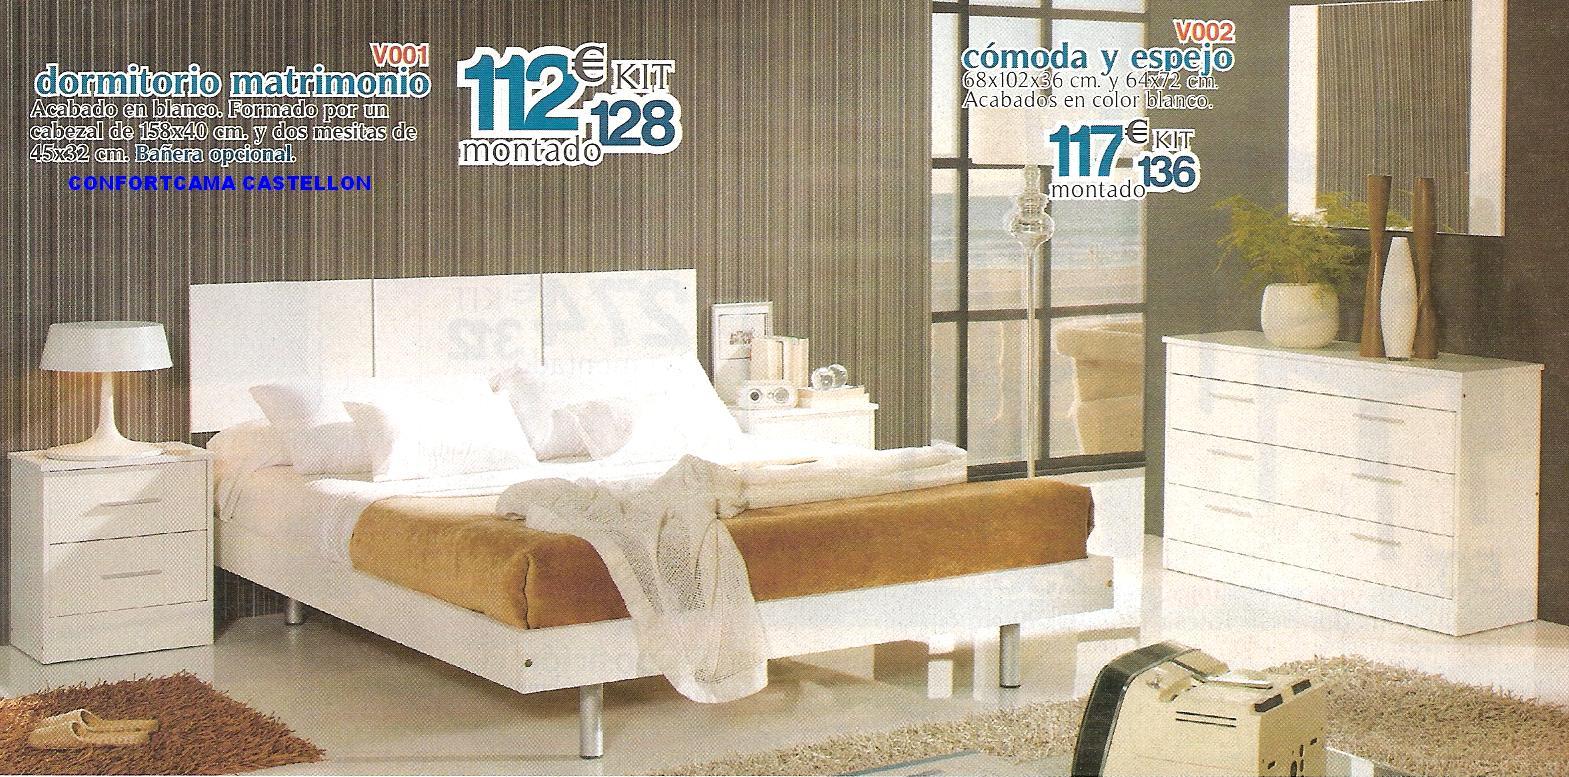 Muebles oferta kit dormitorios de matrimonio for Muebles baratos castellon